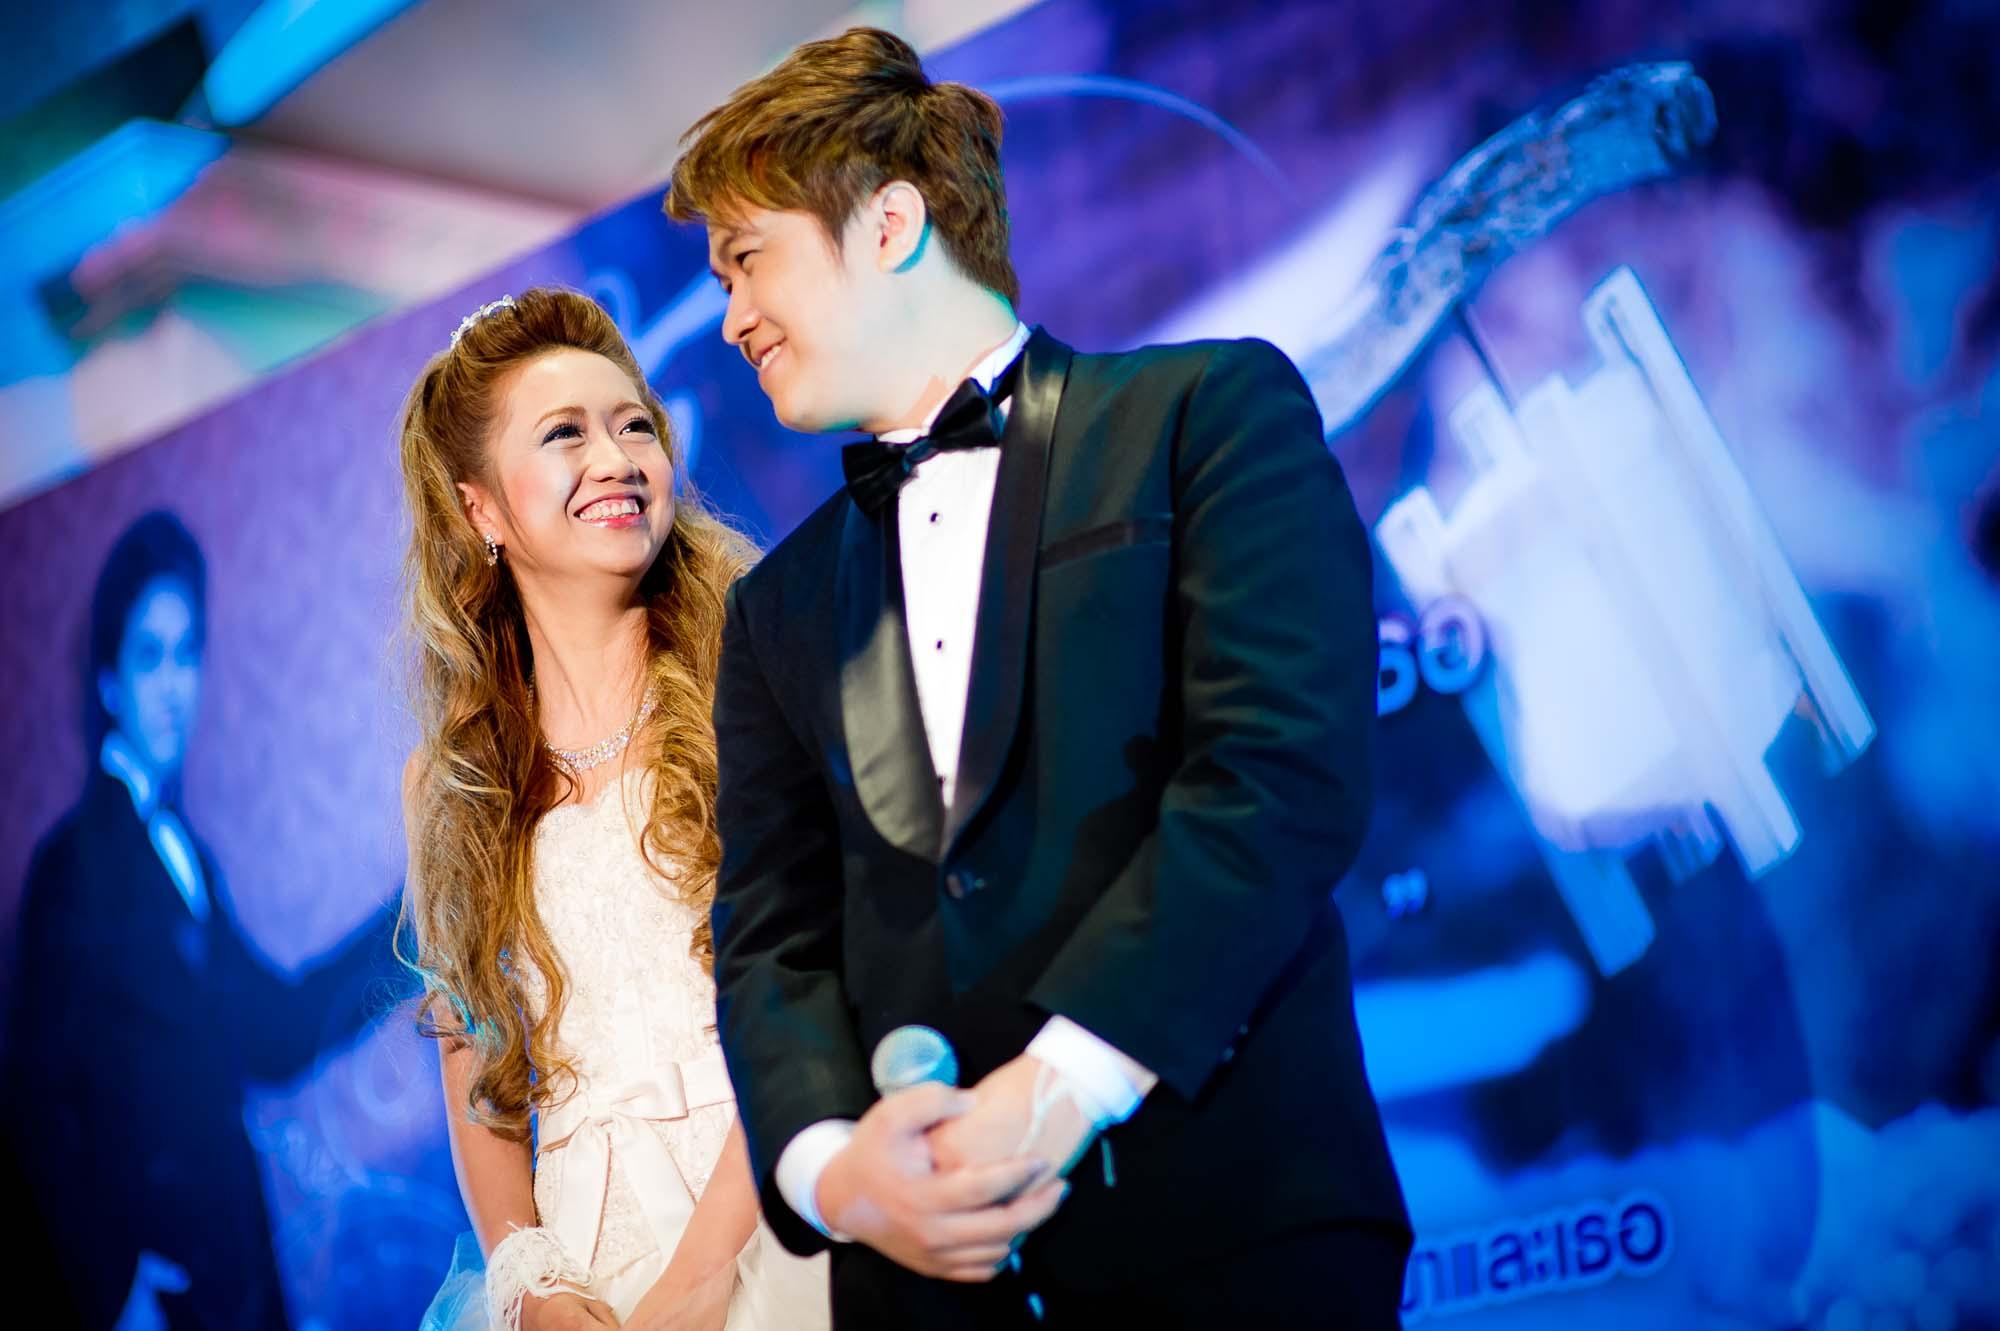 Photo of the Day: Thai Wedding